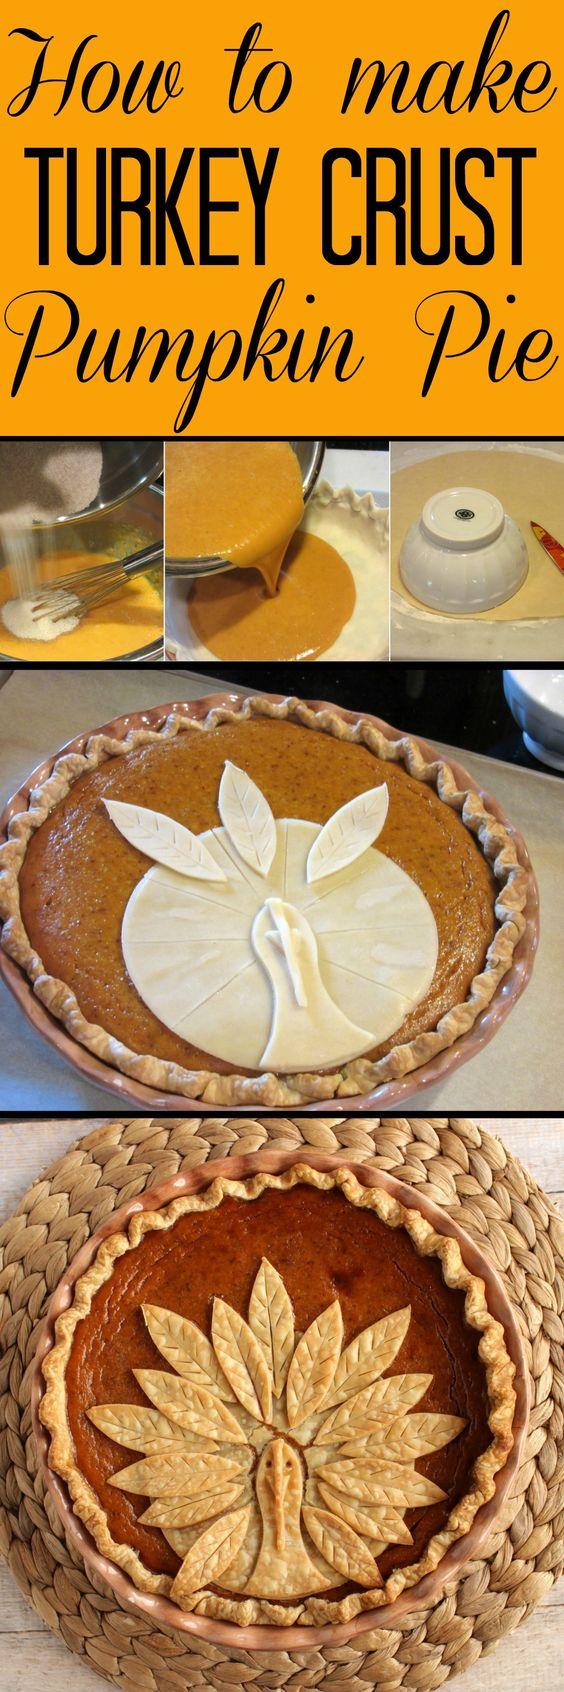 Adorable Turkey Crust Pumpkin Pie.